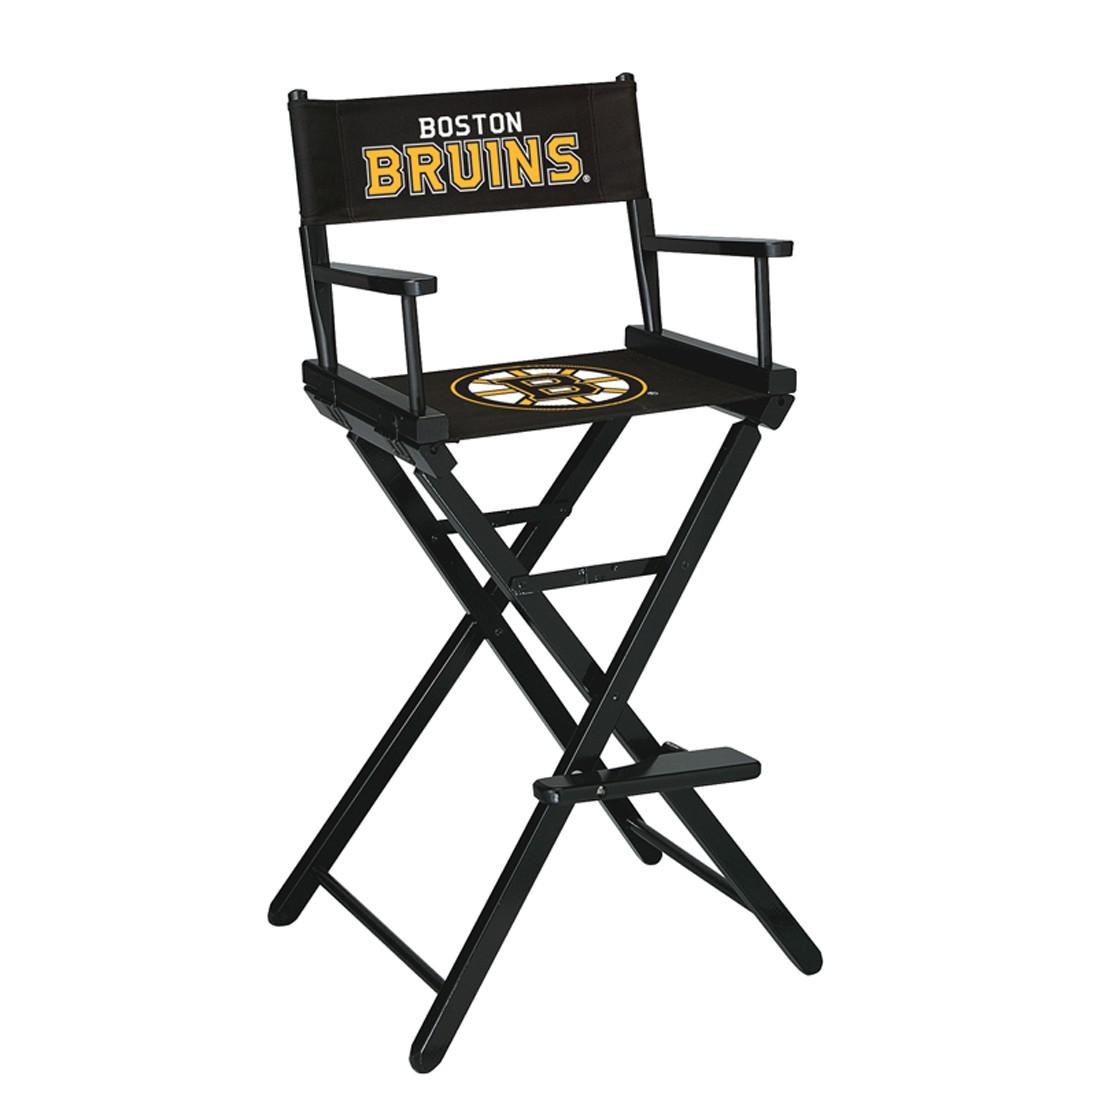 BOSTON BRUINS® BAR HEIGHT DIRECTORS CHAIR